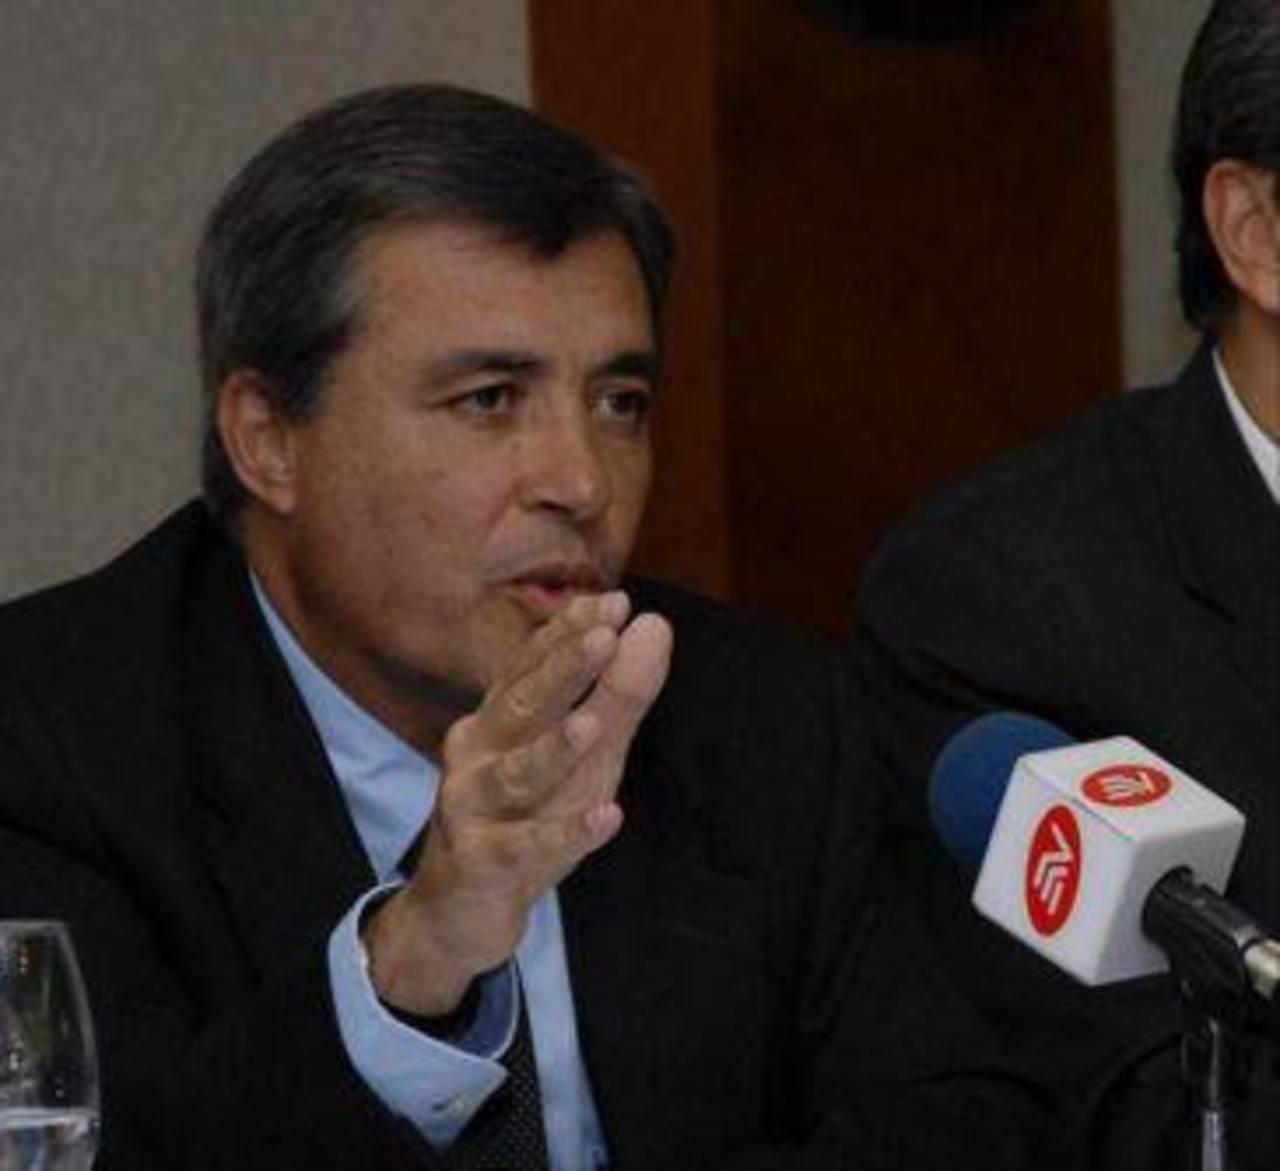 La SIP condena la censura contra canal Globovision